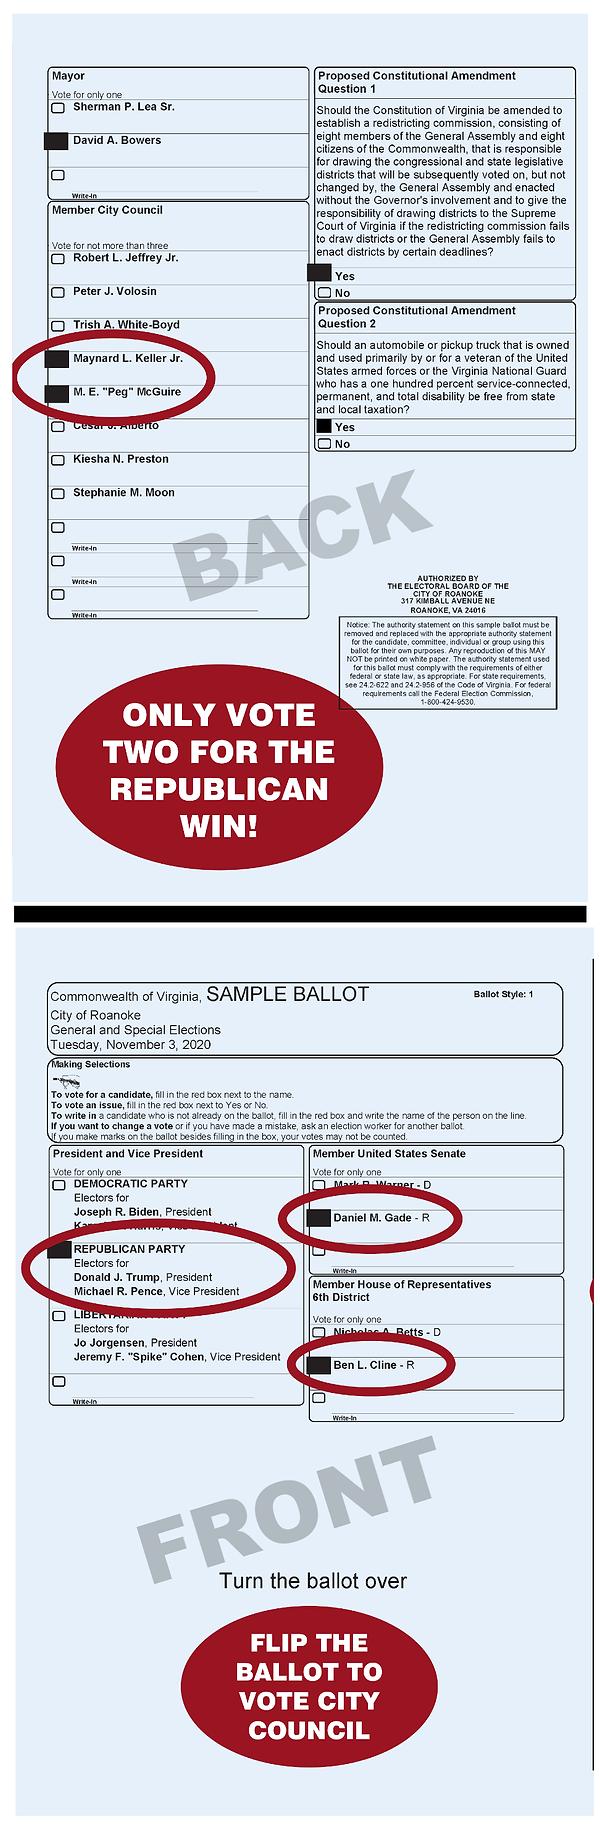 2020 Roanoke City Republican Sample Ball